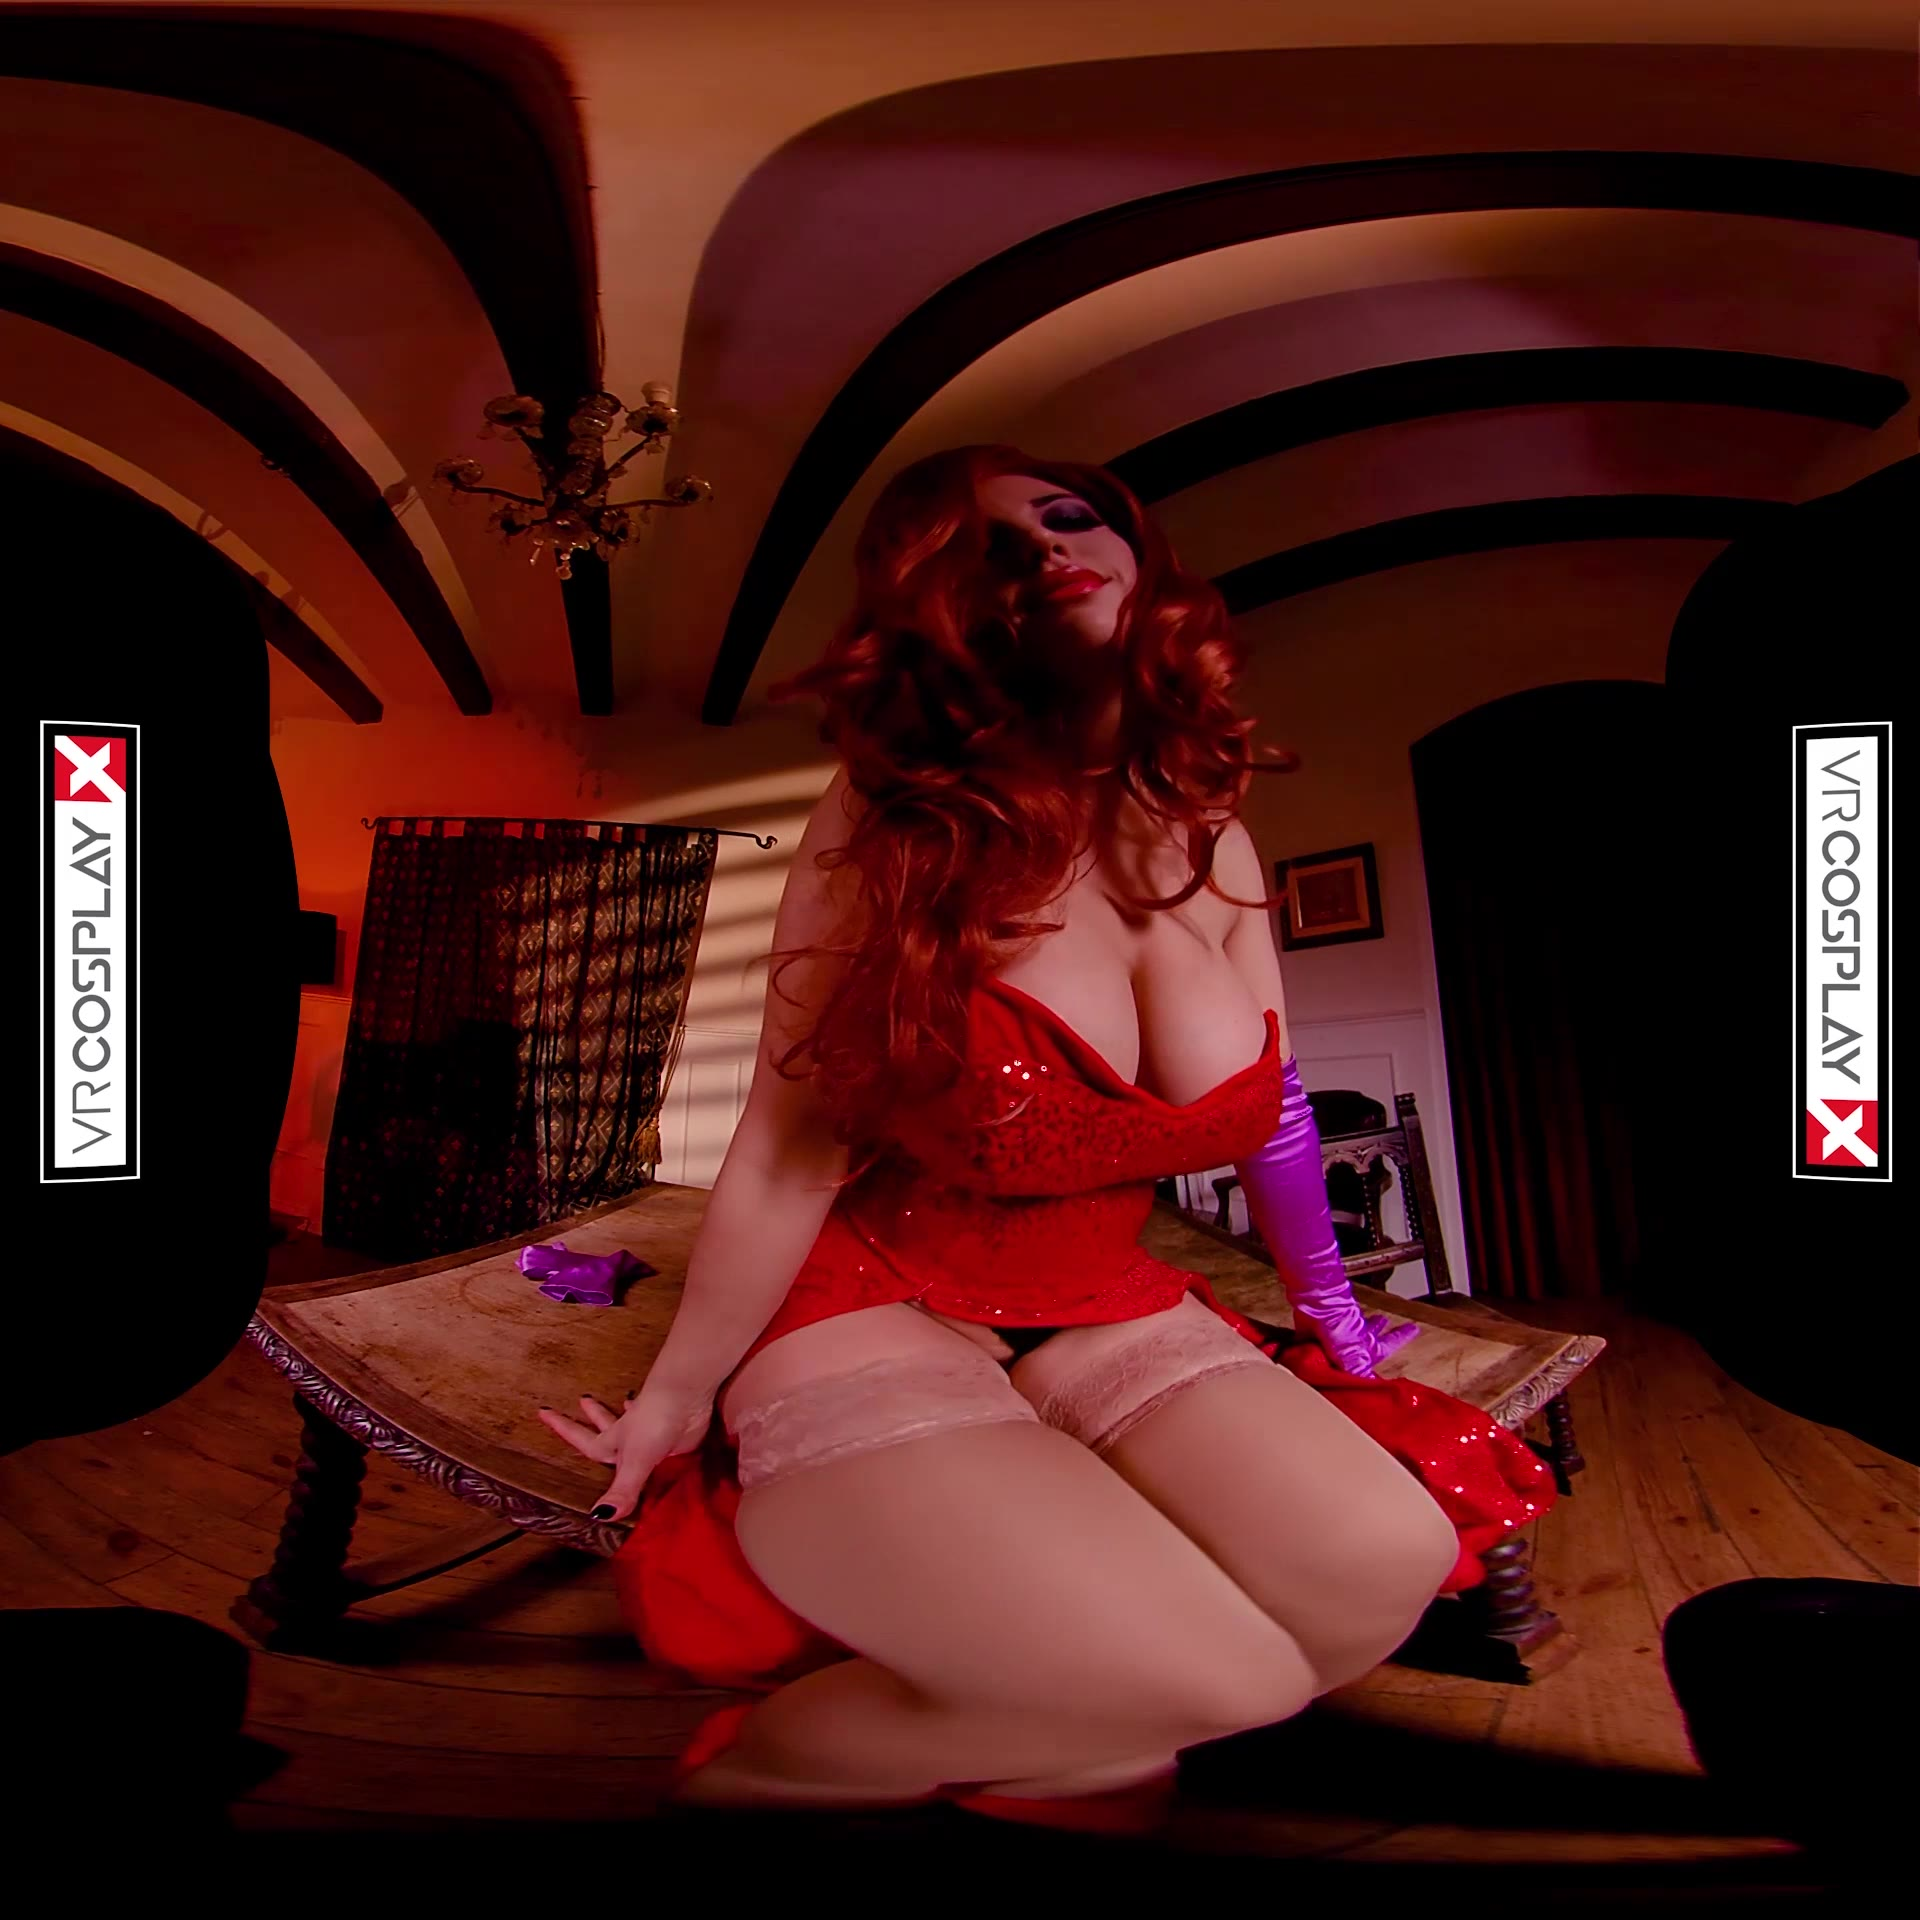 Jessica rabbit porn parody